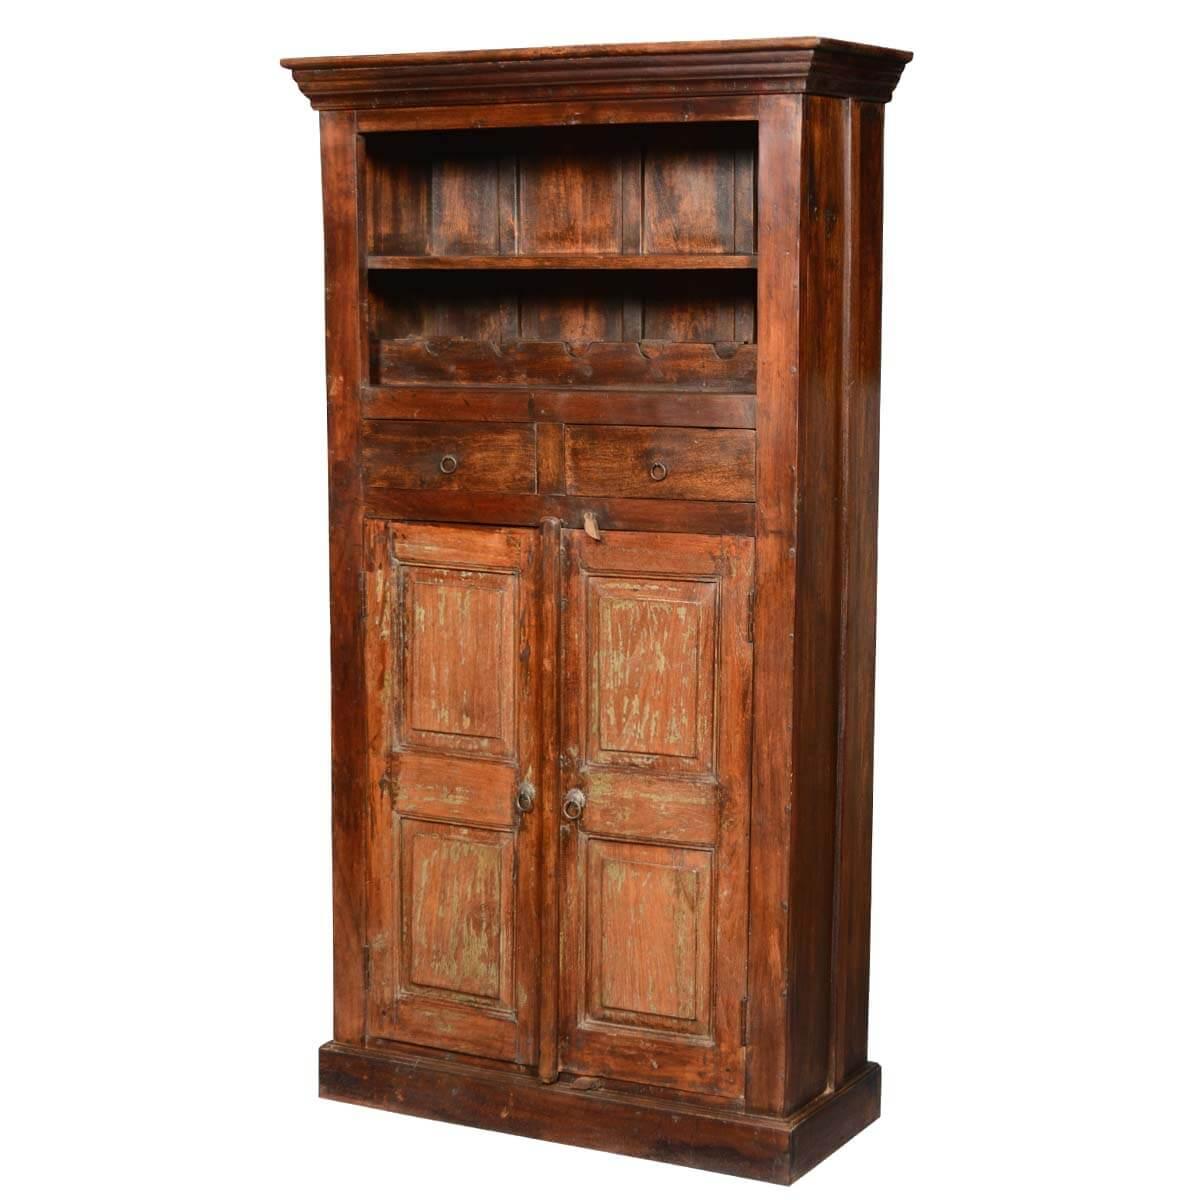 "Rustic Reclaimed Wood 71"" Tall Wine Rack Liquor Storage"